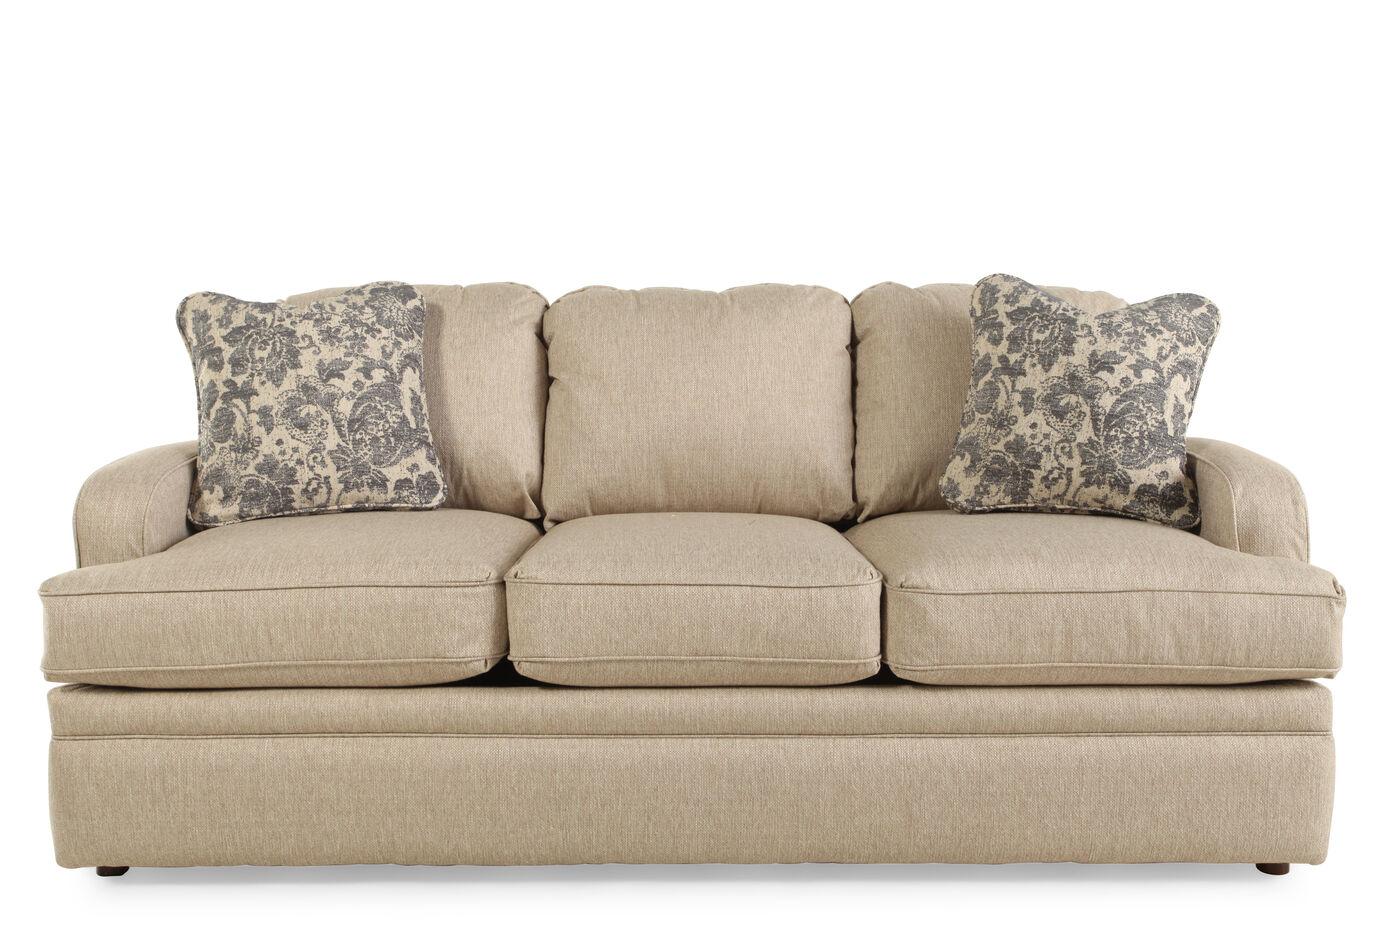 Lazy boy diana sleeper sofa for Sofa cama medellin